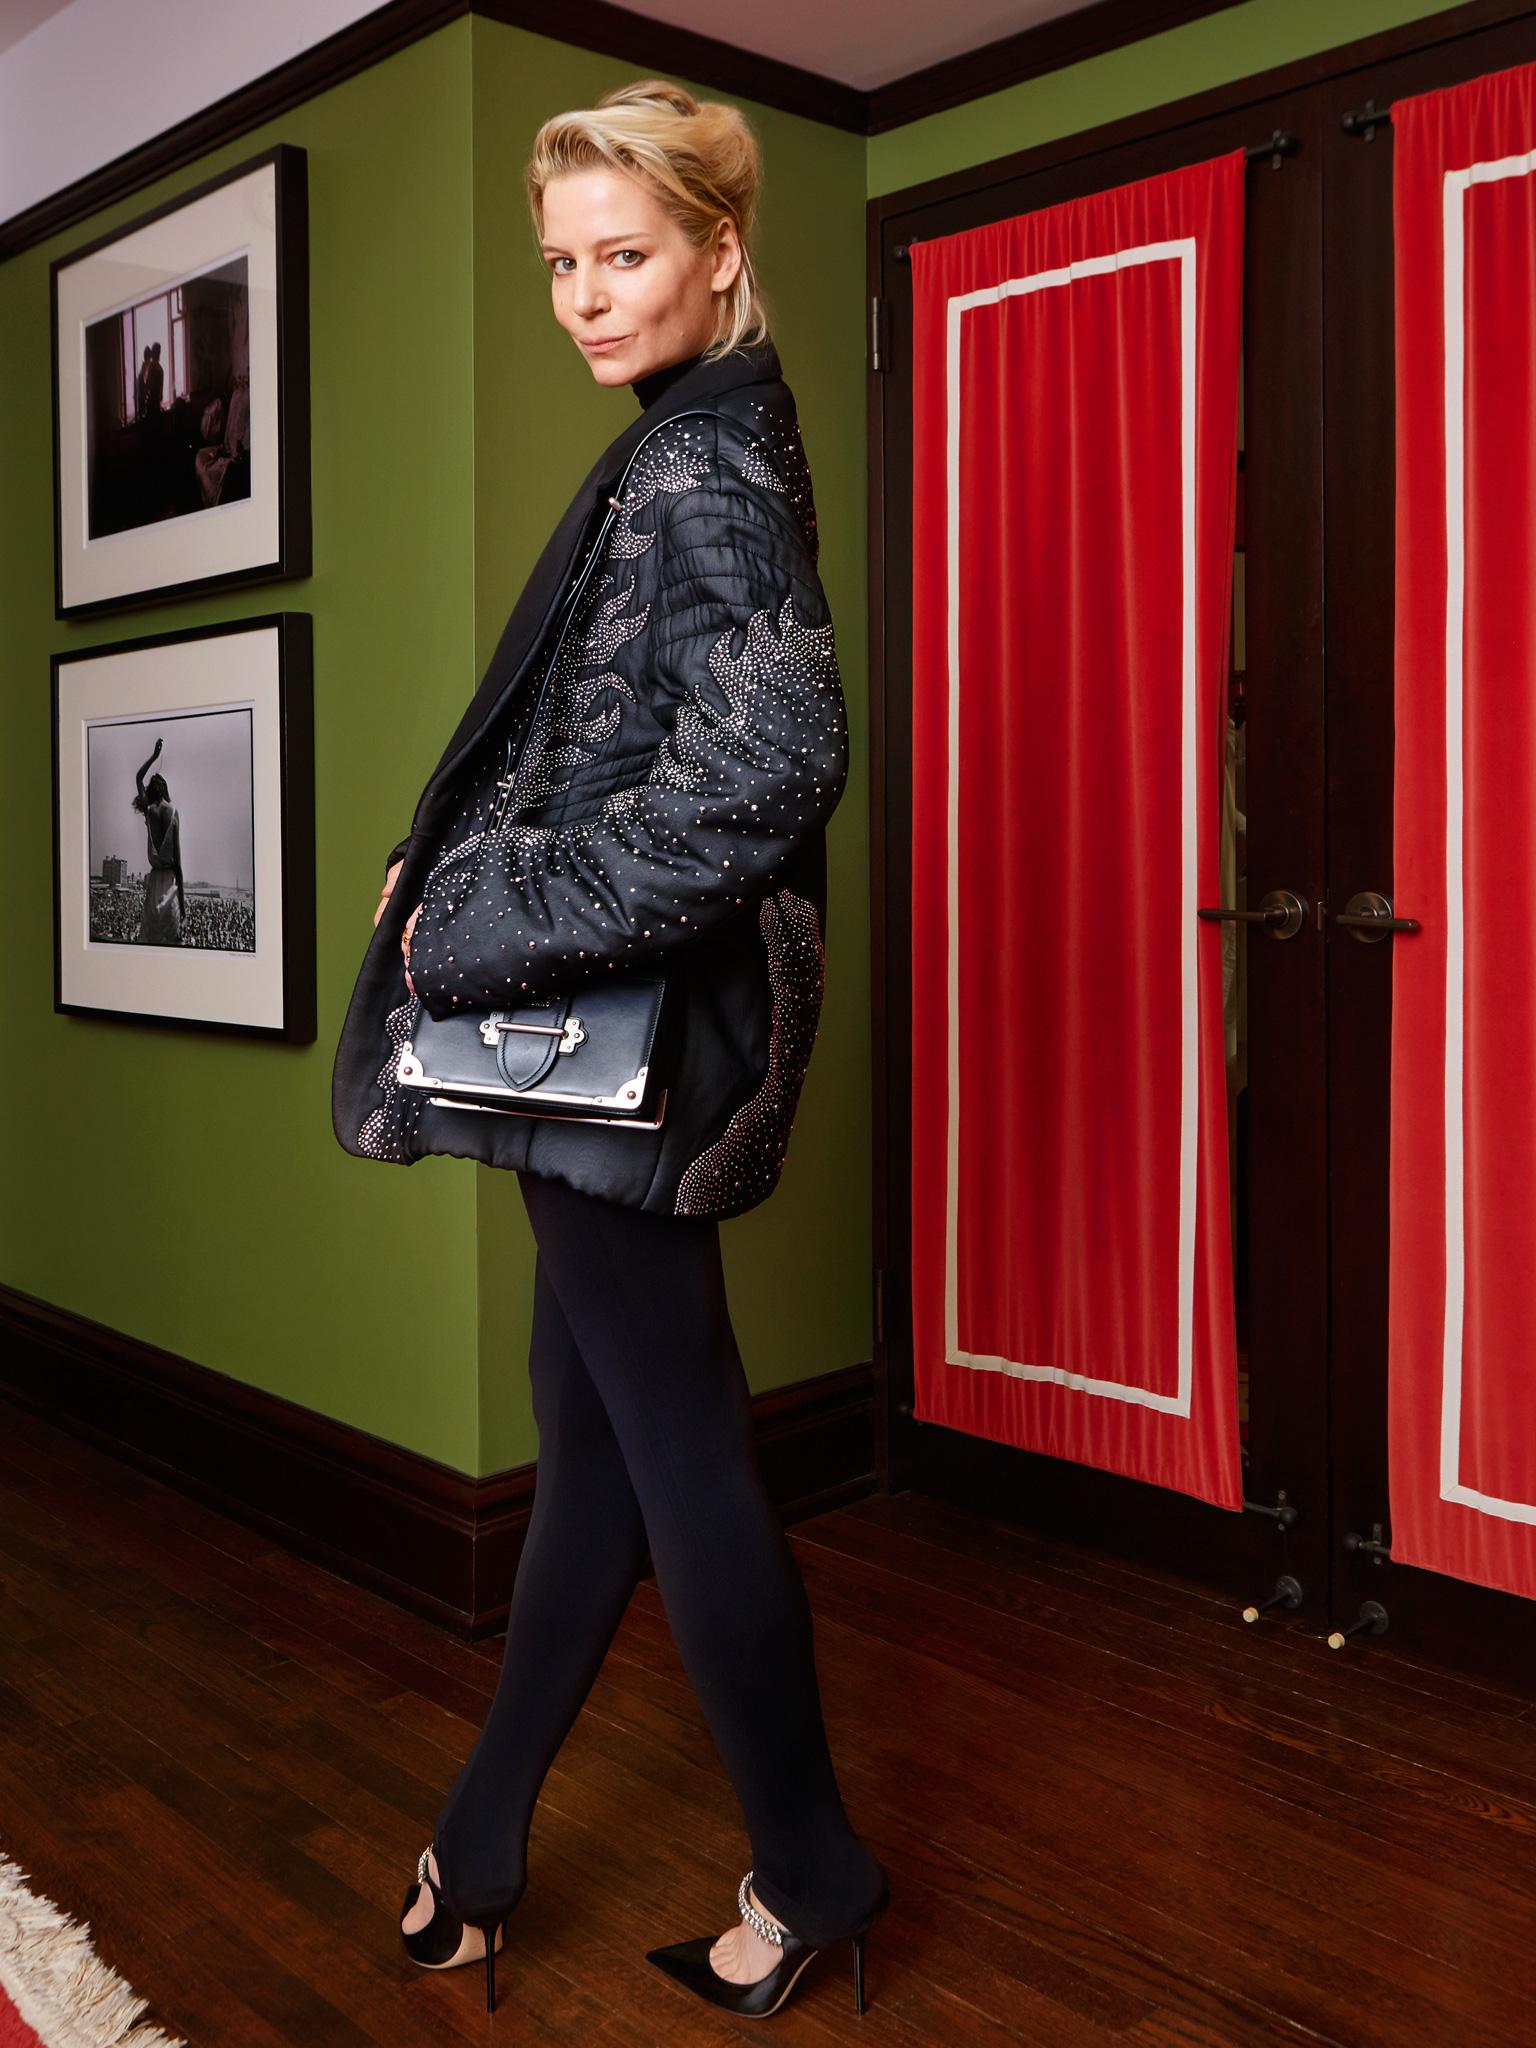 Details: Leggings:    SPANX   , Body Suit:    ALIX   , Beaded Top:    Ermanno Scervino   , Shoes:    Jimmy Choo   , Blazer:    Louis Vuitton   , Bag:    Prada